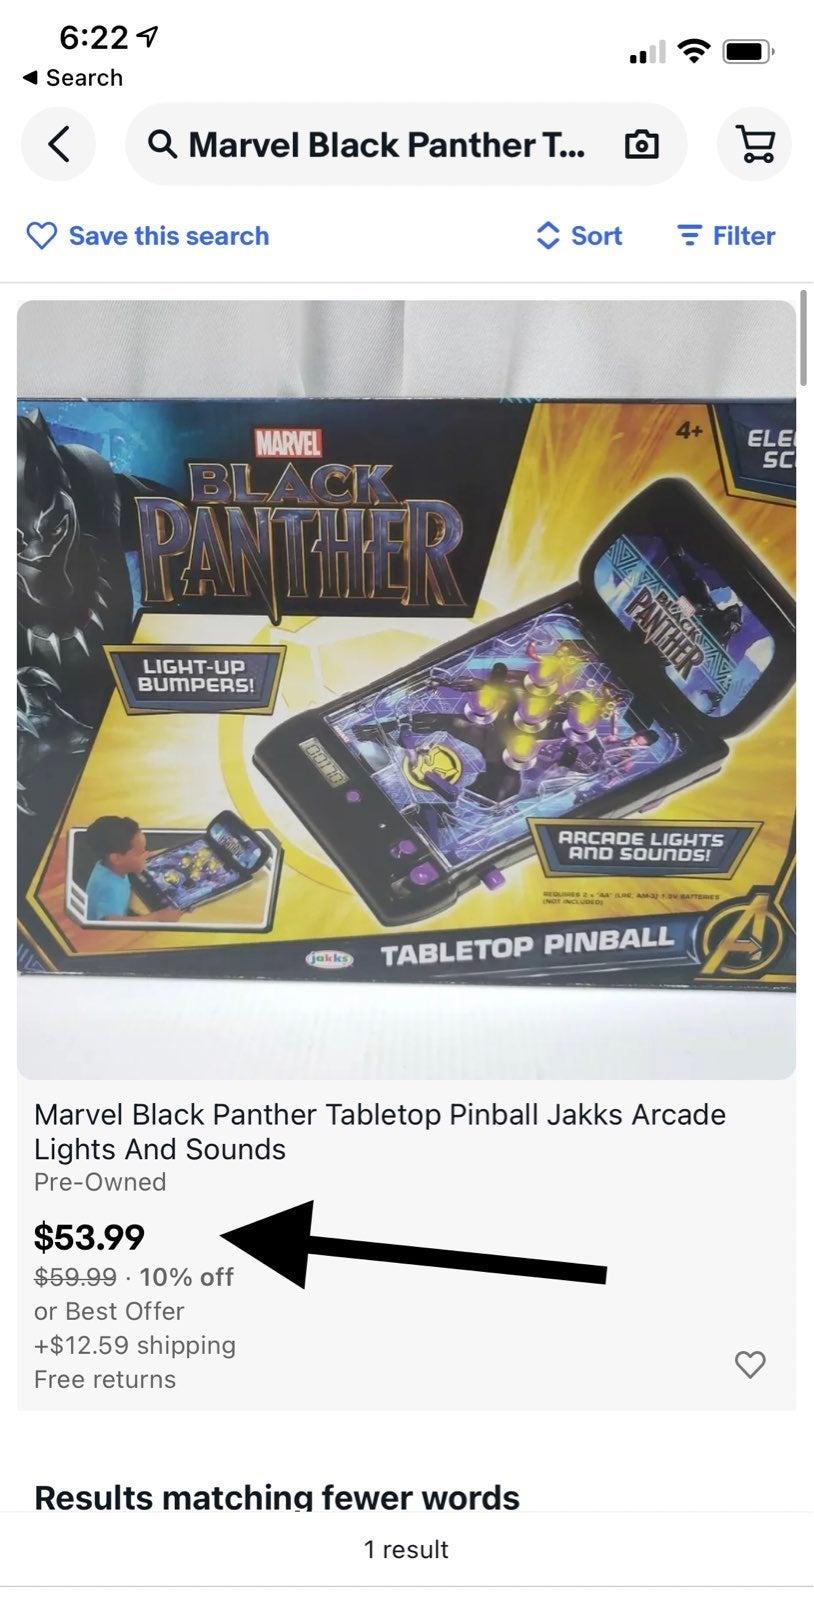 Marvel Black Panther Tabletop Pinball